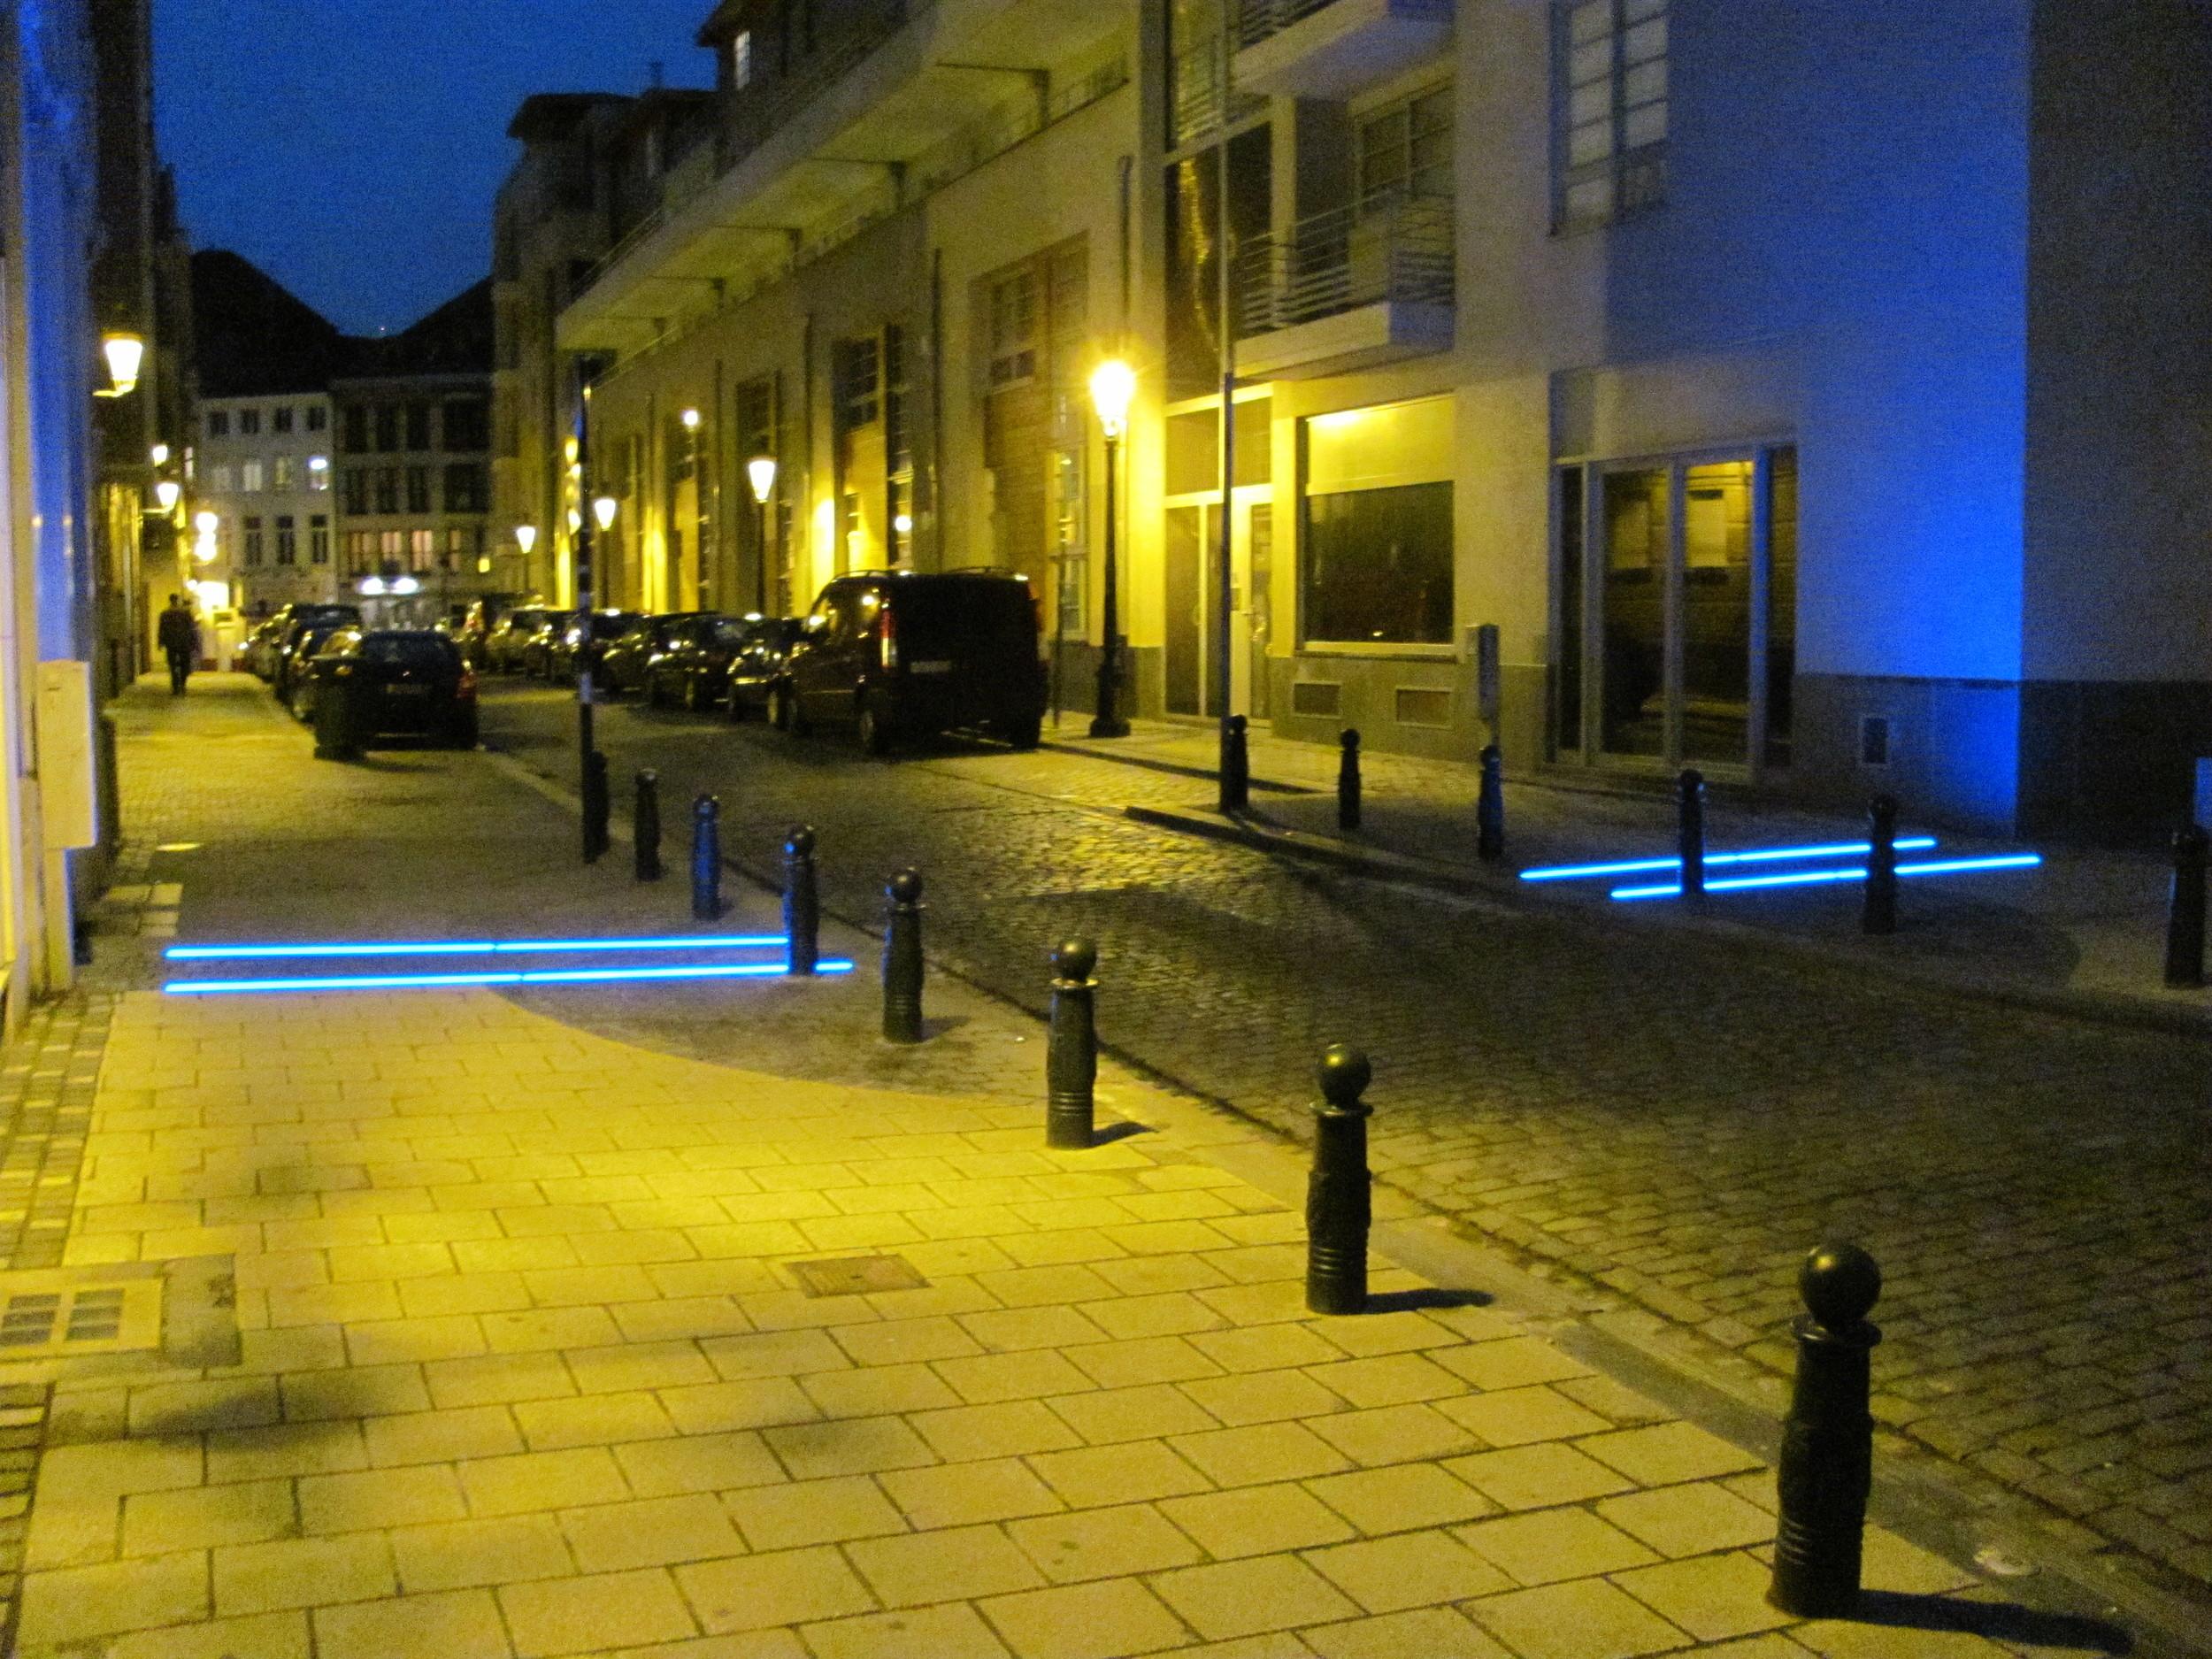 Public Art Installation, Old City, Brussels, Belgium, VHS 2010